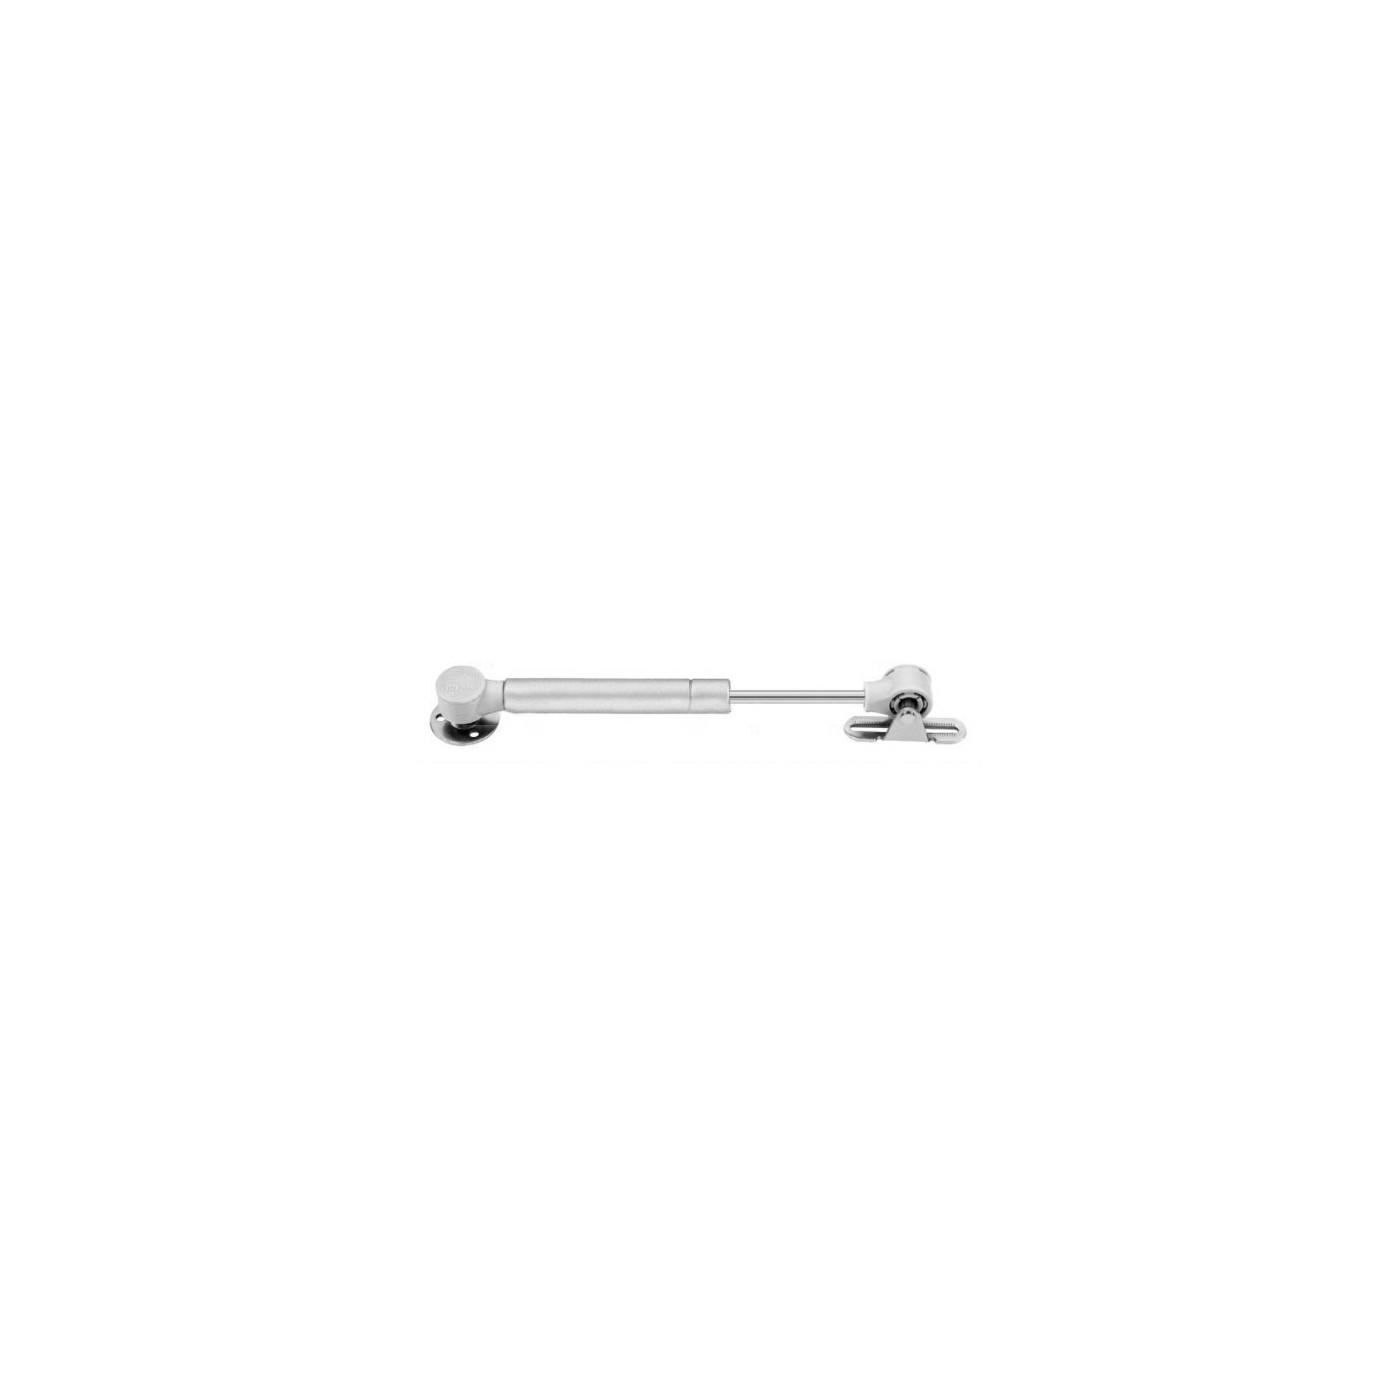 Vérin à gaz universel avec supports (50N / 5kg, 172 mm, argent)